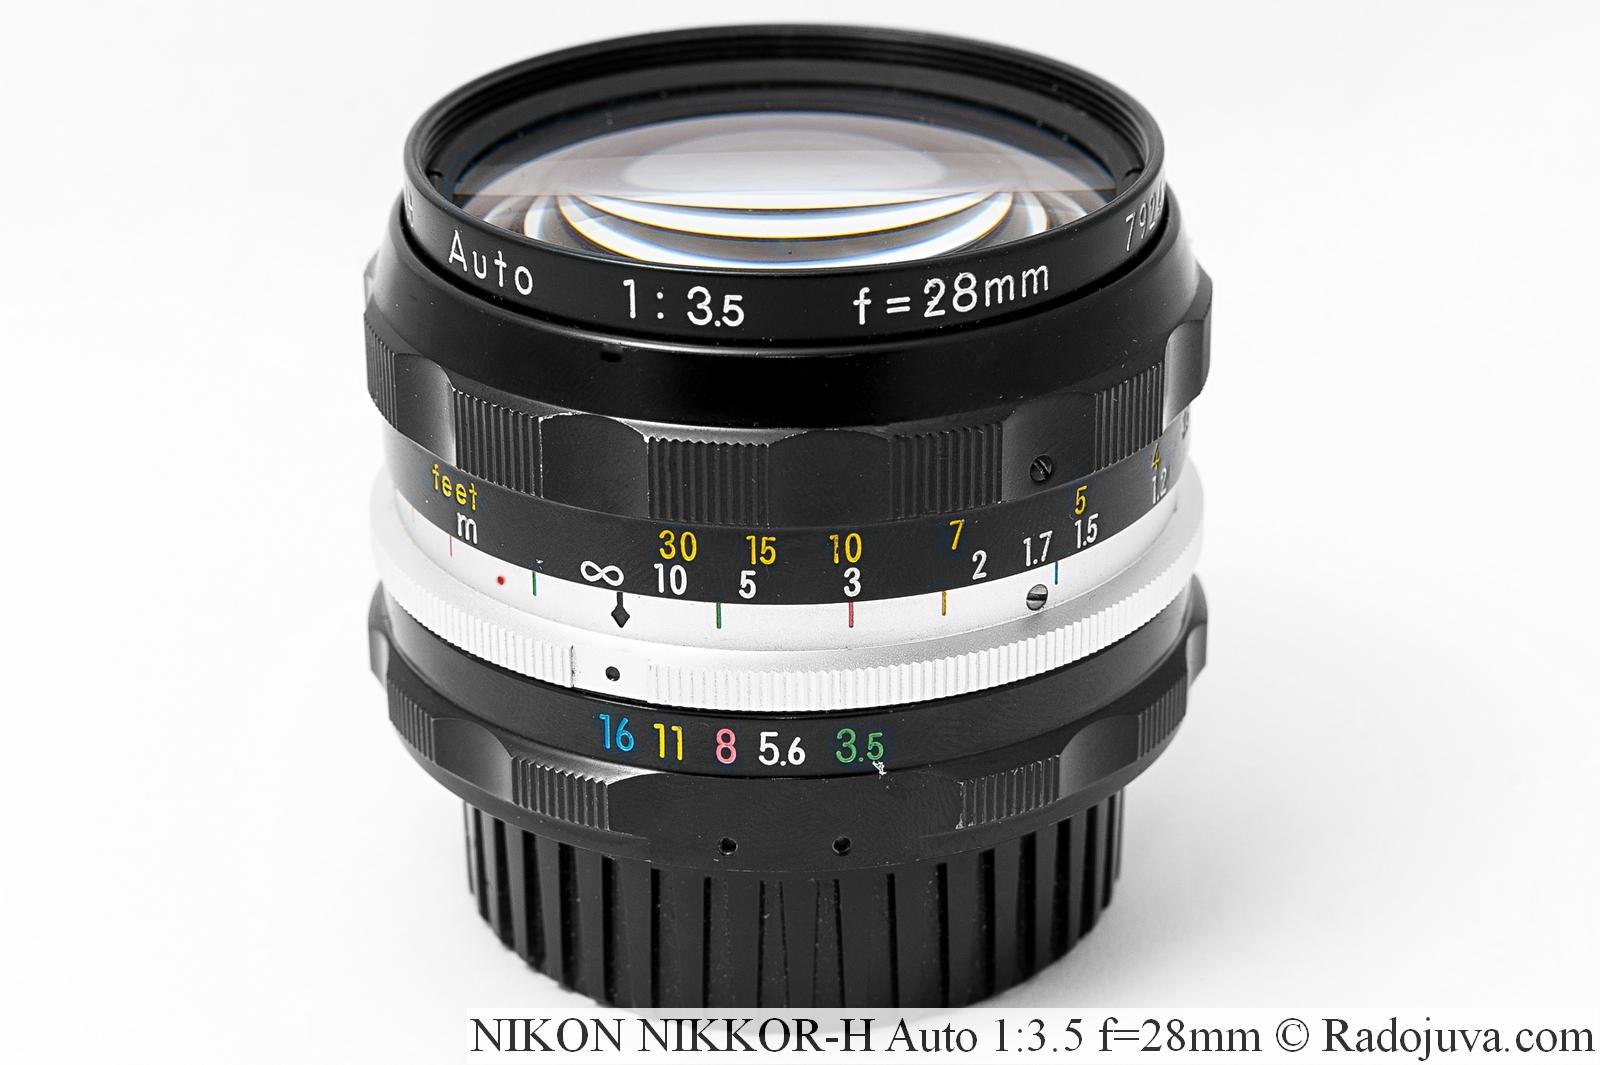 NIKON NIKKOR-H Auto 1:3.5 f=28mm